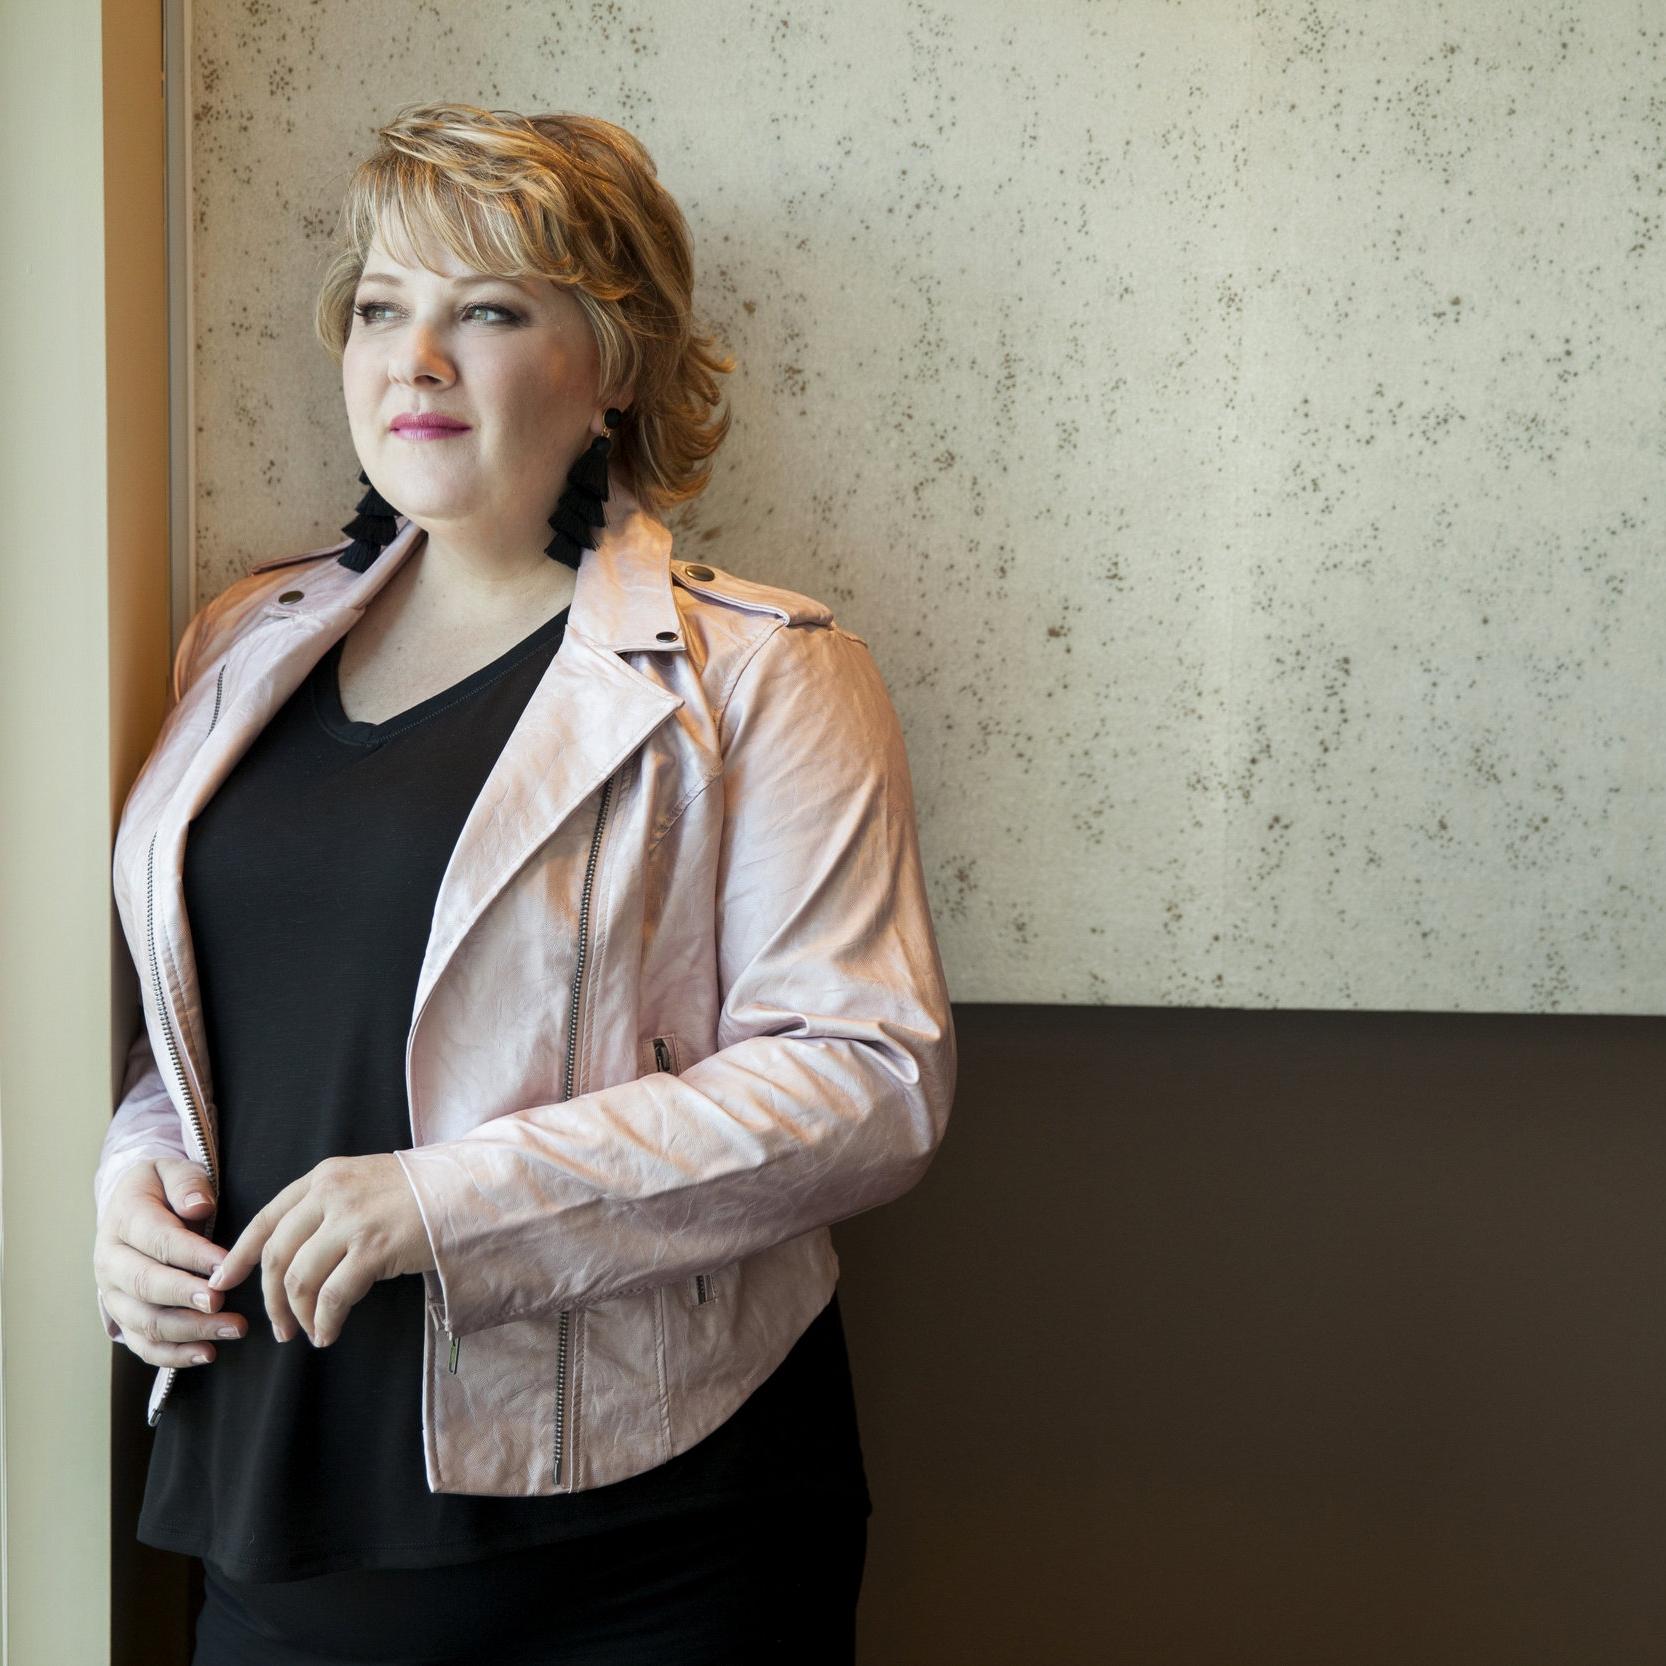 Author, Lisa Rehurek